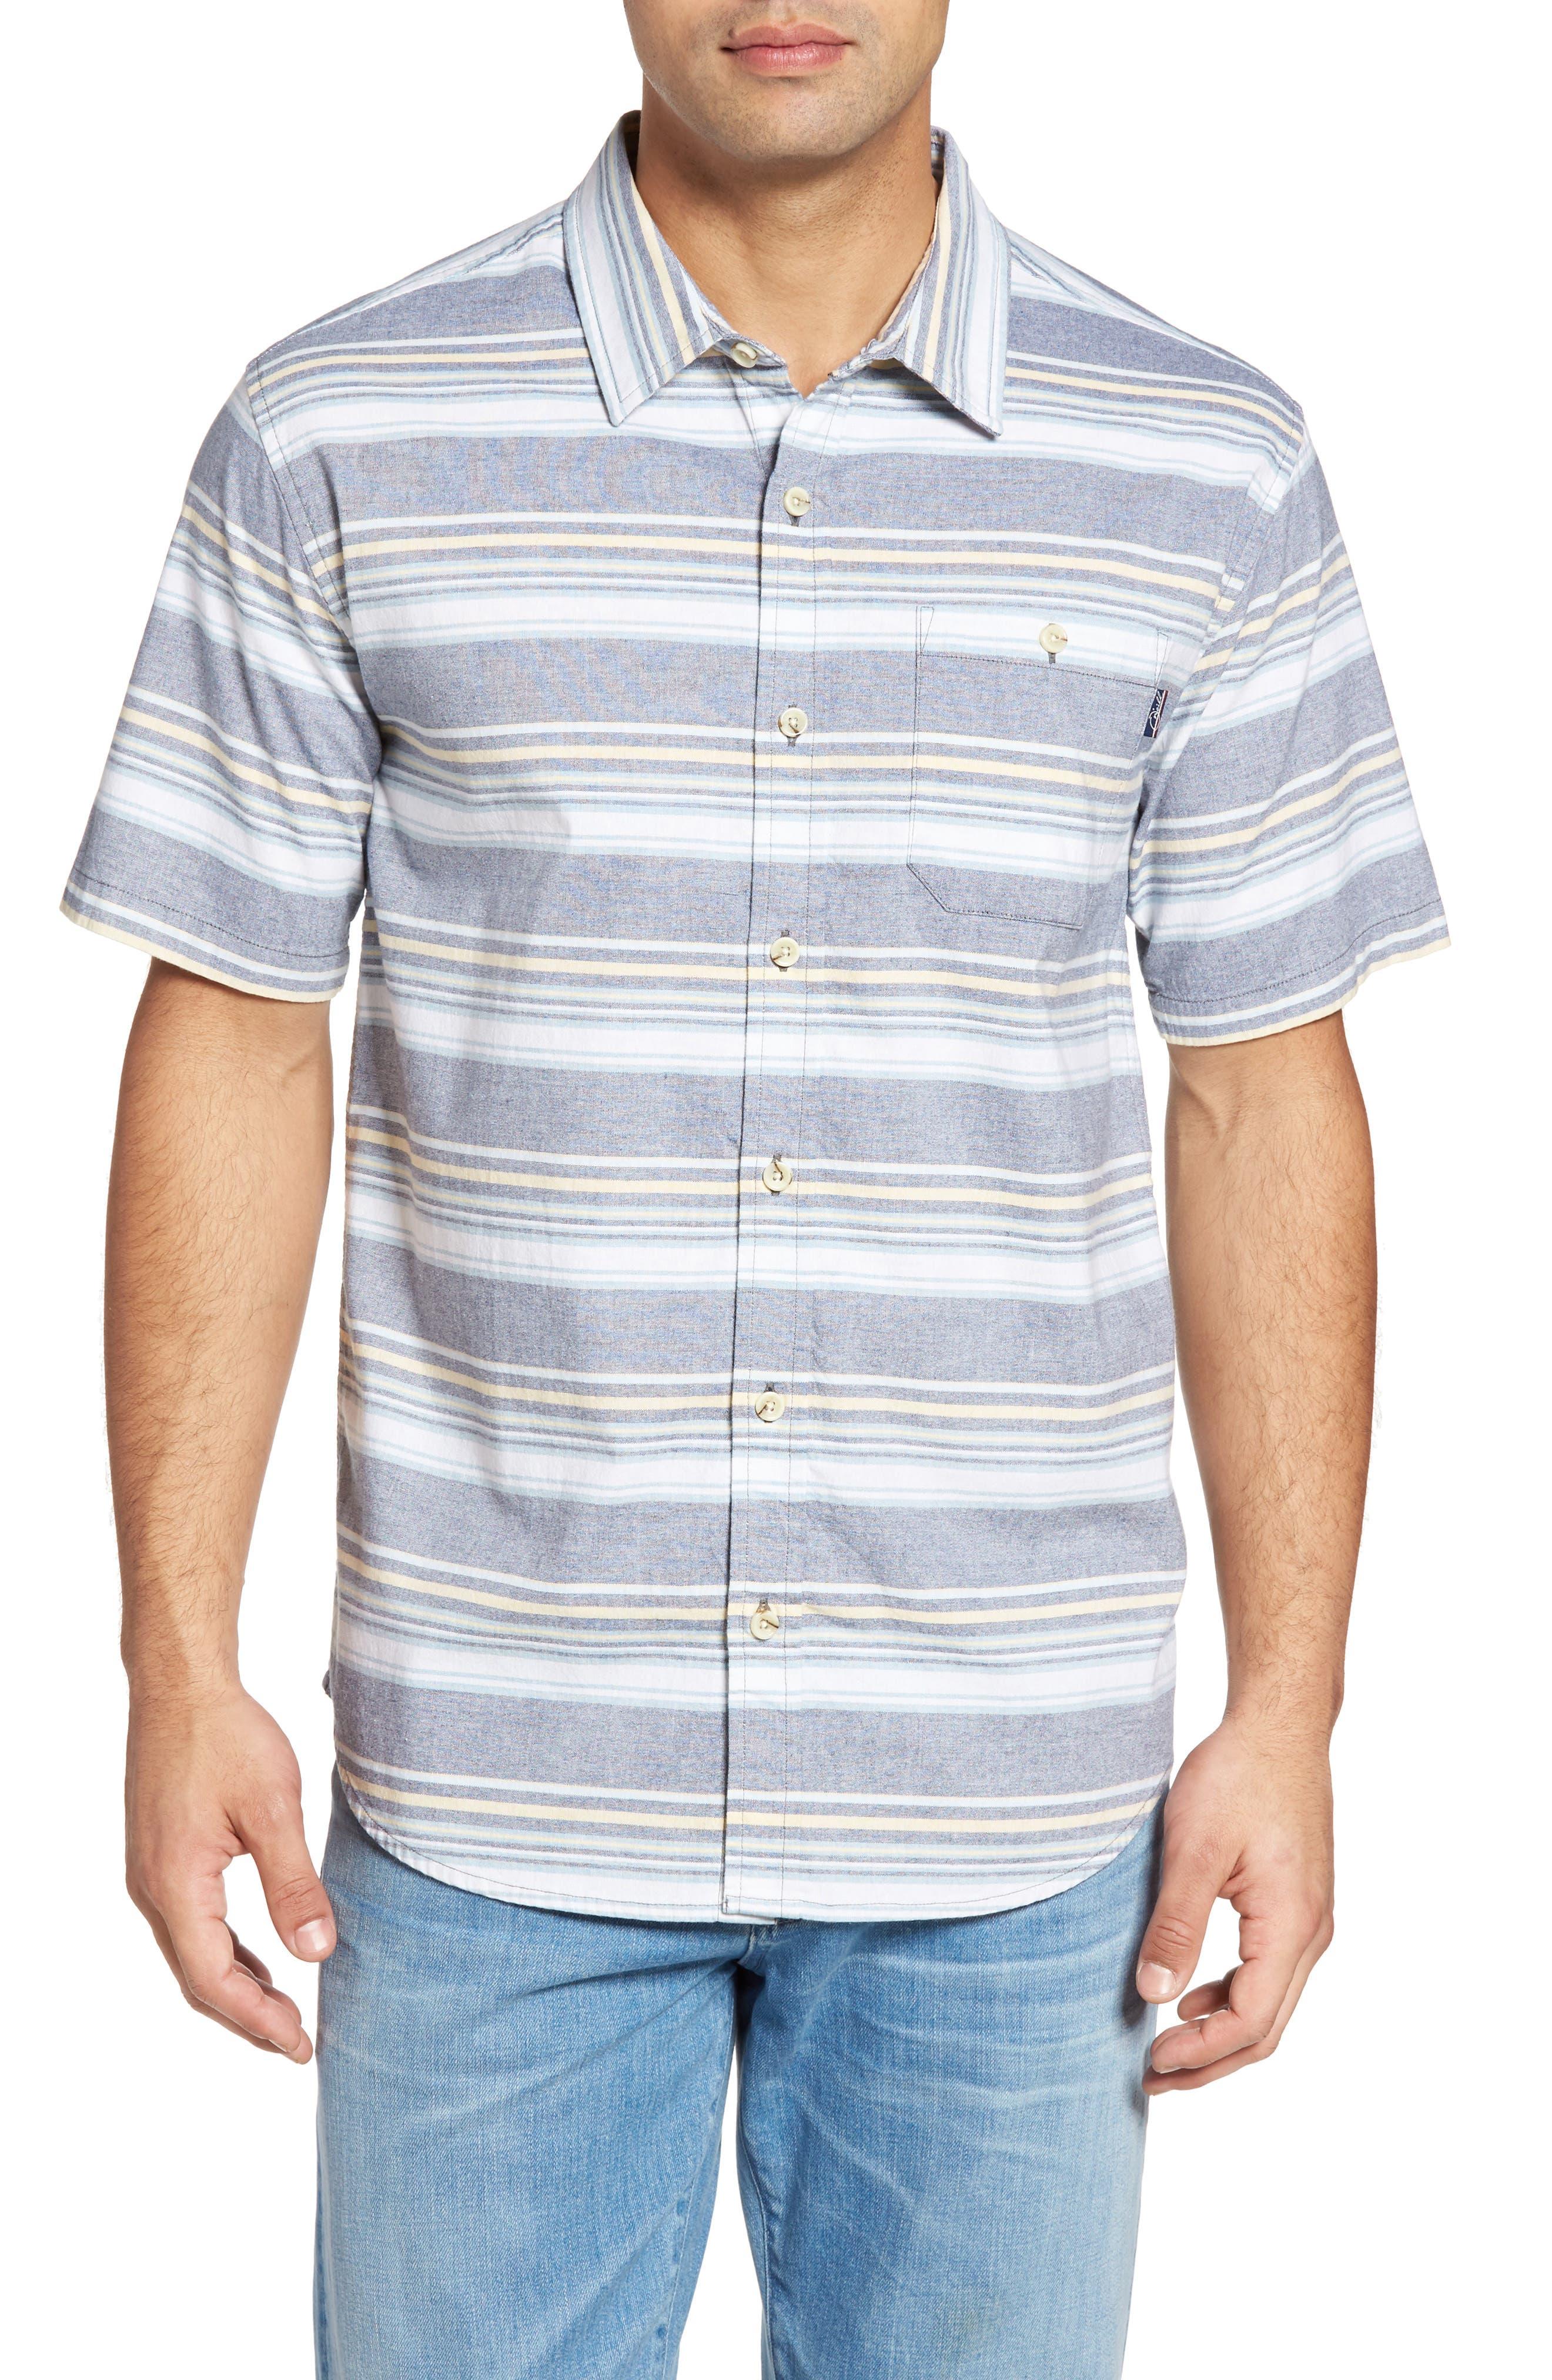 Pura Vida Sport Shirt,                             Main thumbnail 1, color,                             Navy